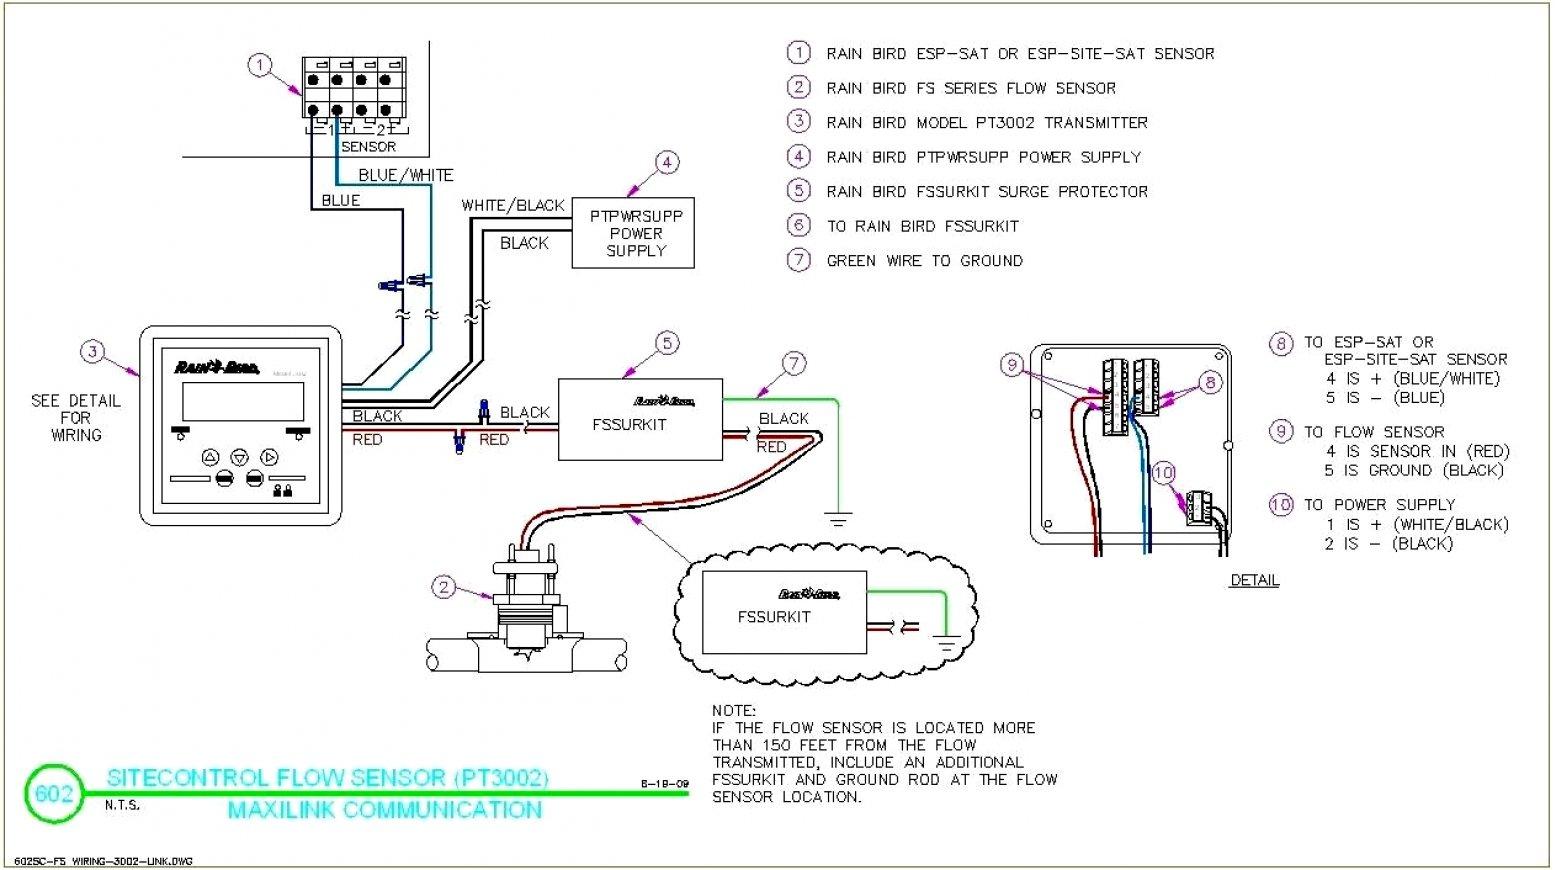 Elegant Submersible Well Pump Wiring Diagram Need Verification Terry - 3 Wire Submersible Well Pump Wiring Diagram